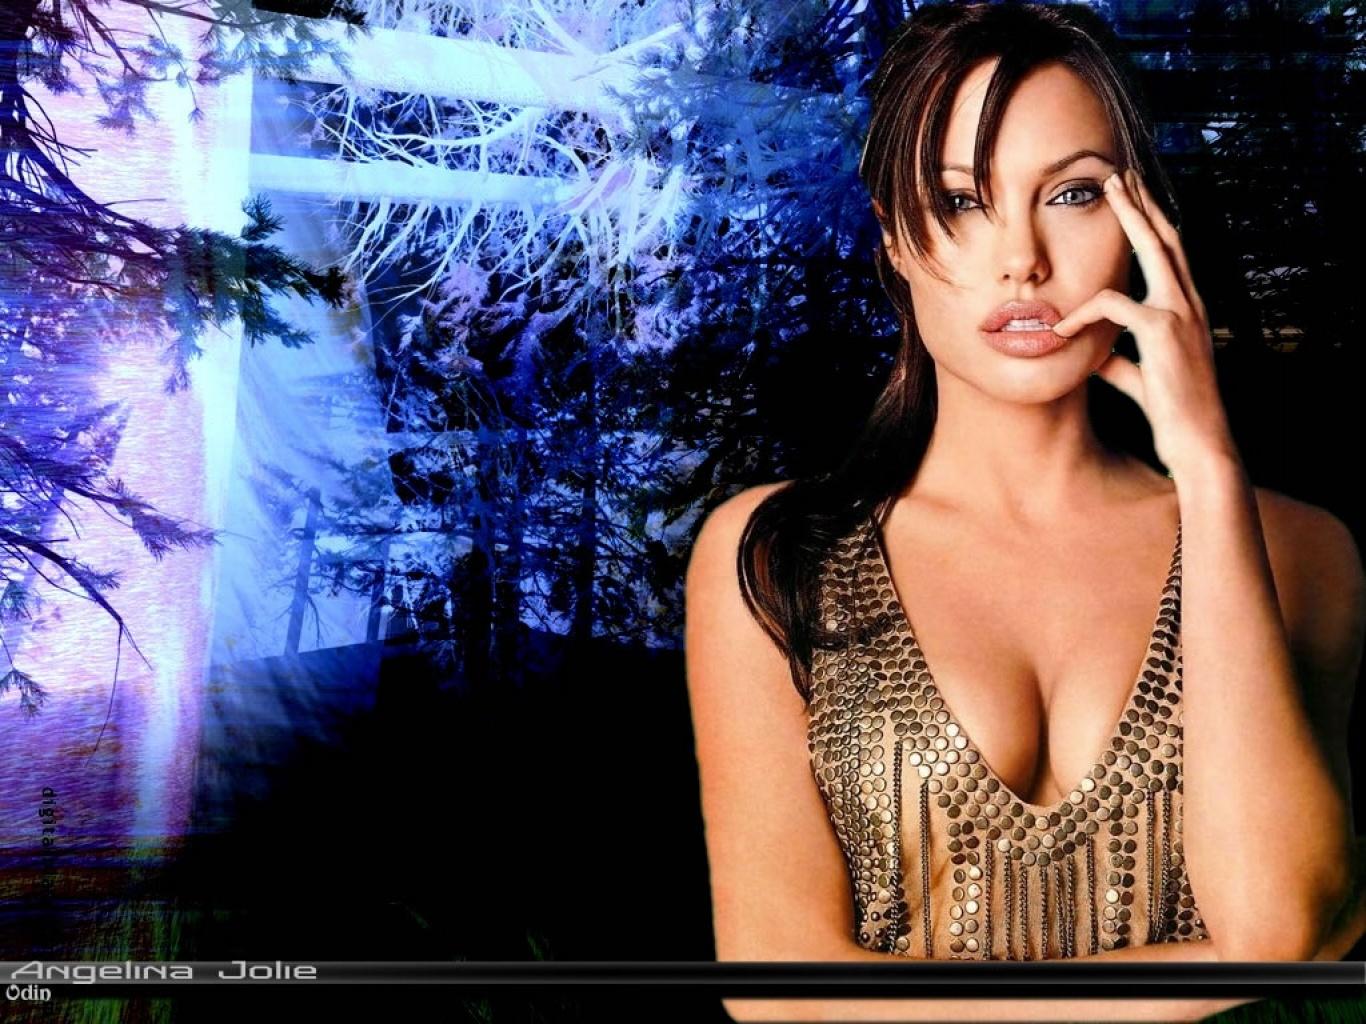 Анджелина джоли сосёт 24 фотография